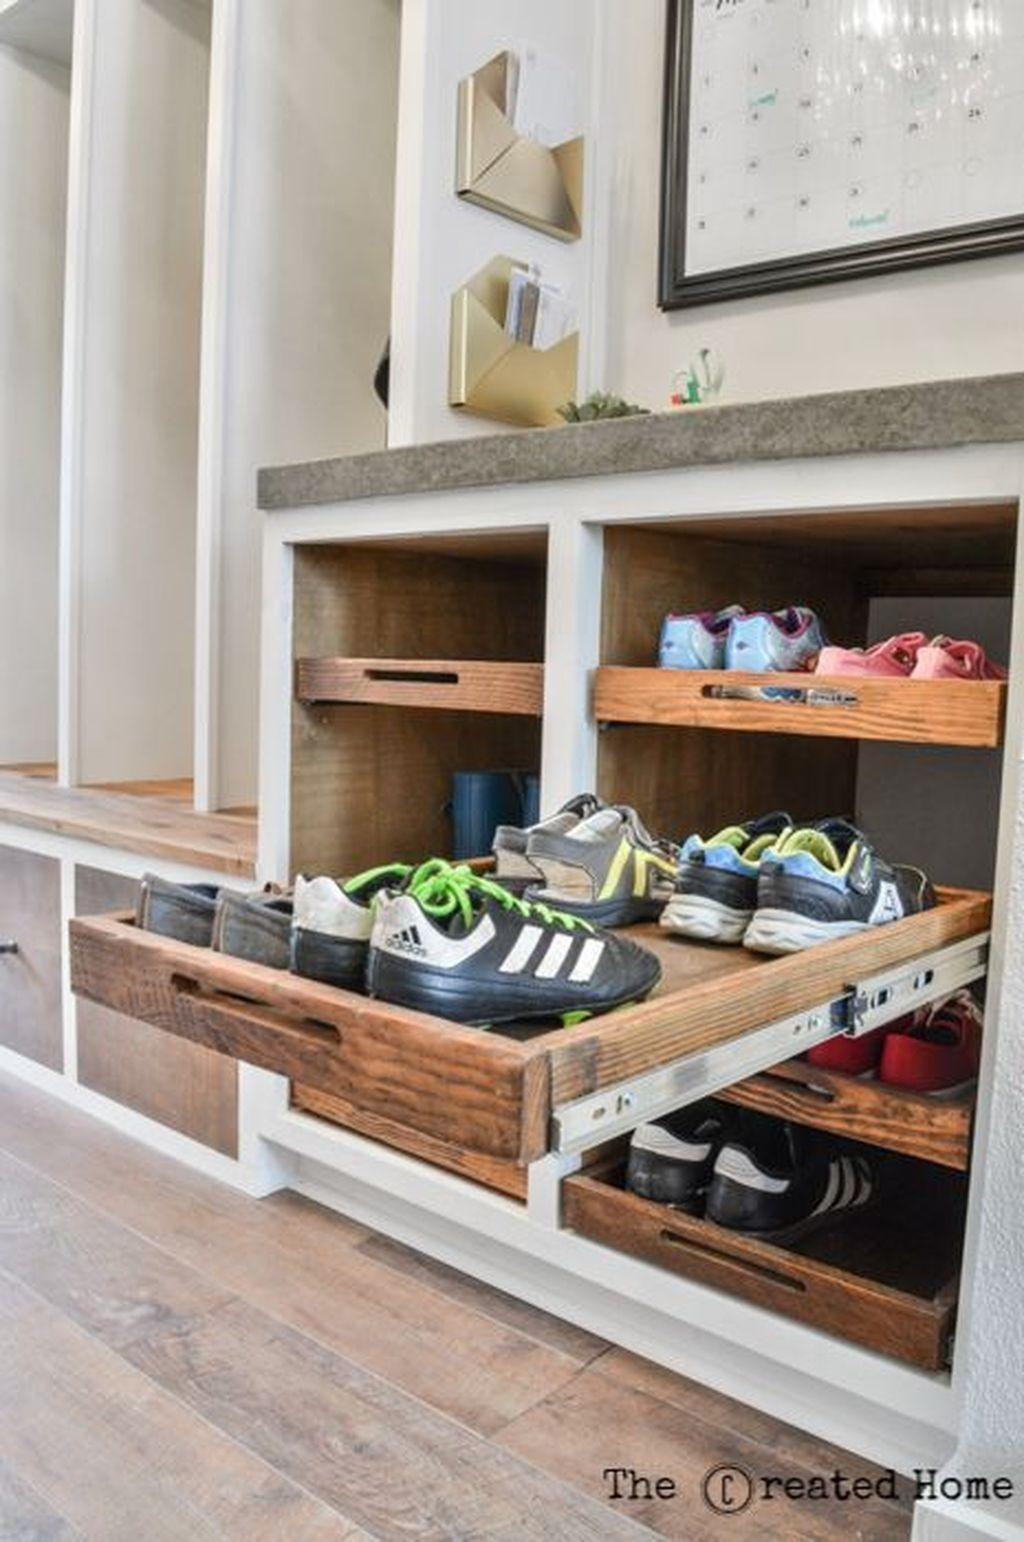 20 Spectacular Diy Shoe Storage Ideas For Best Home Organization